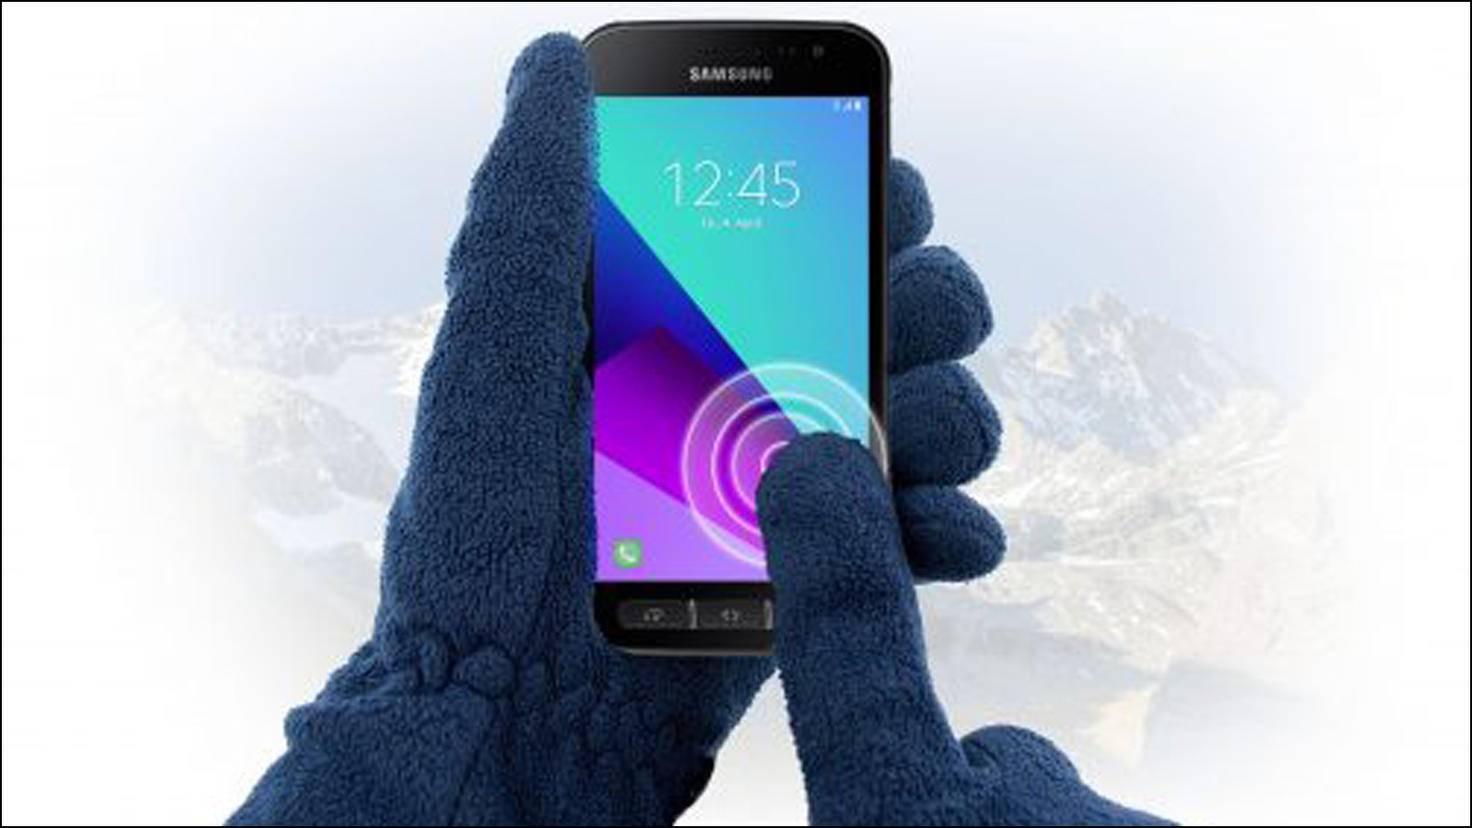 Samsung Galaxy Xcover 4